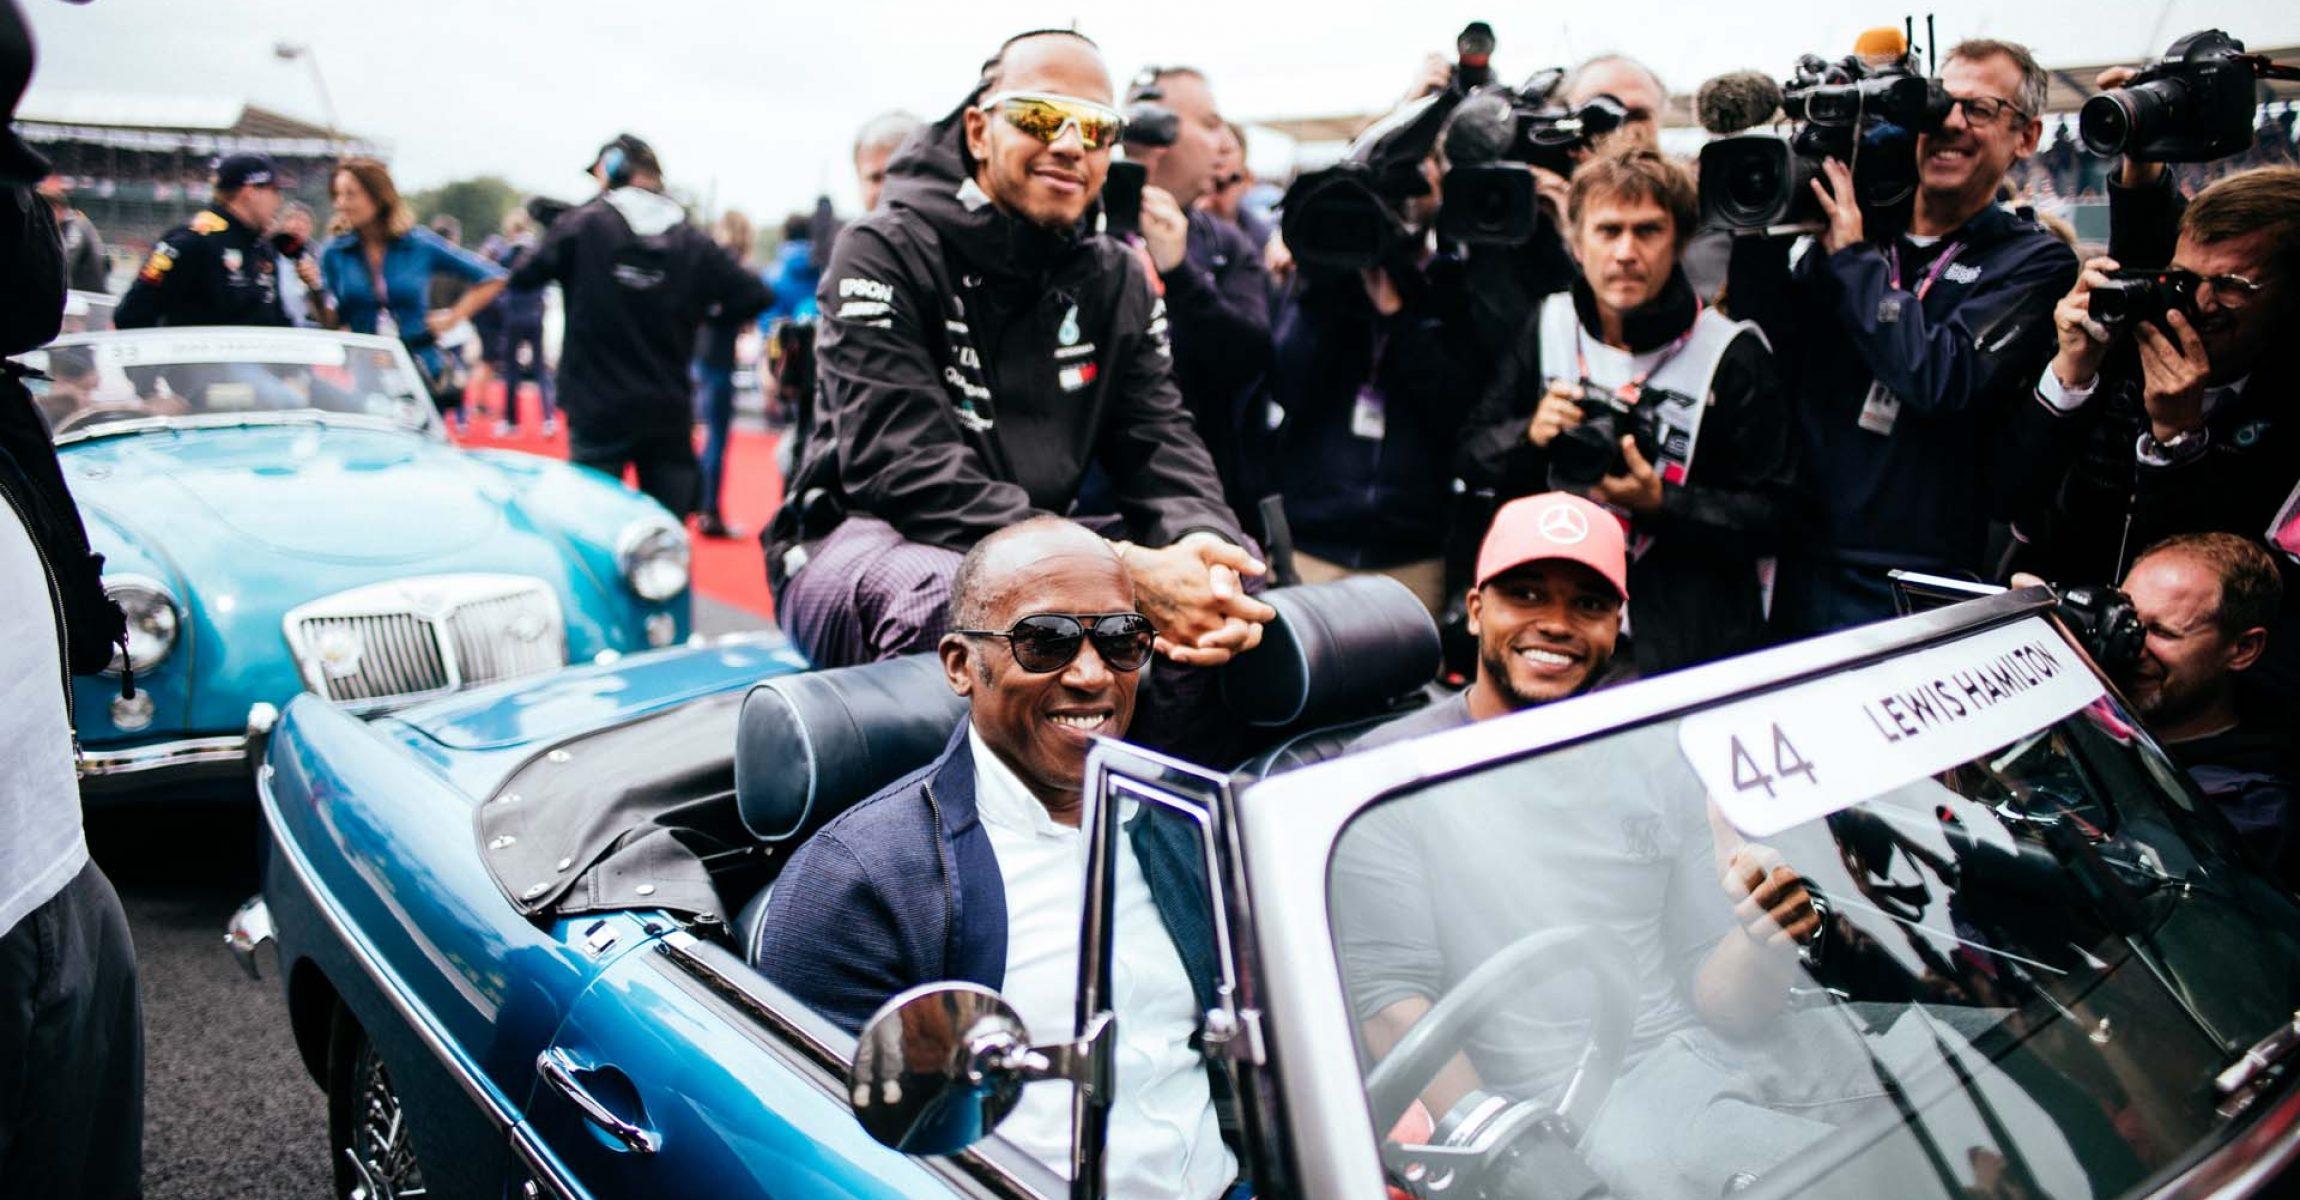 2019 British Grand Prix, Sunday - Paul Ripke Anthony Hamilton Nicolas Hamilton Lewis Hamilton Mercedes